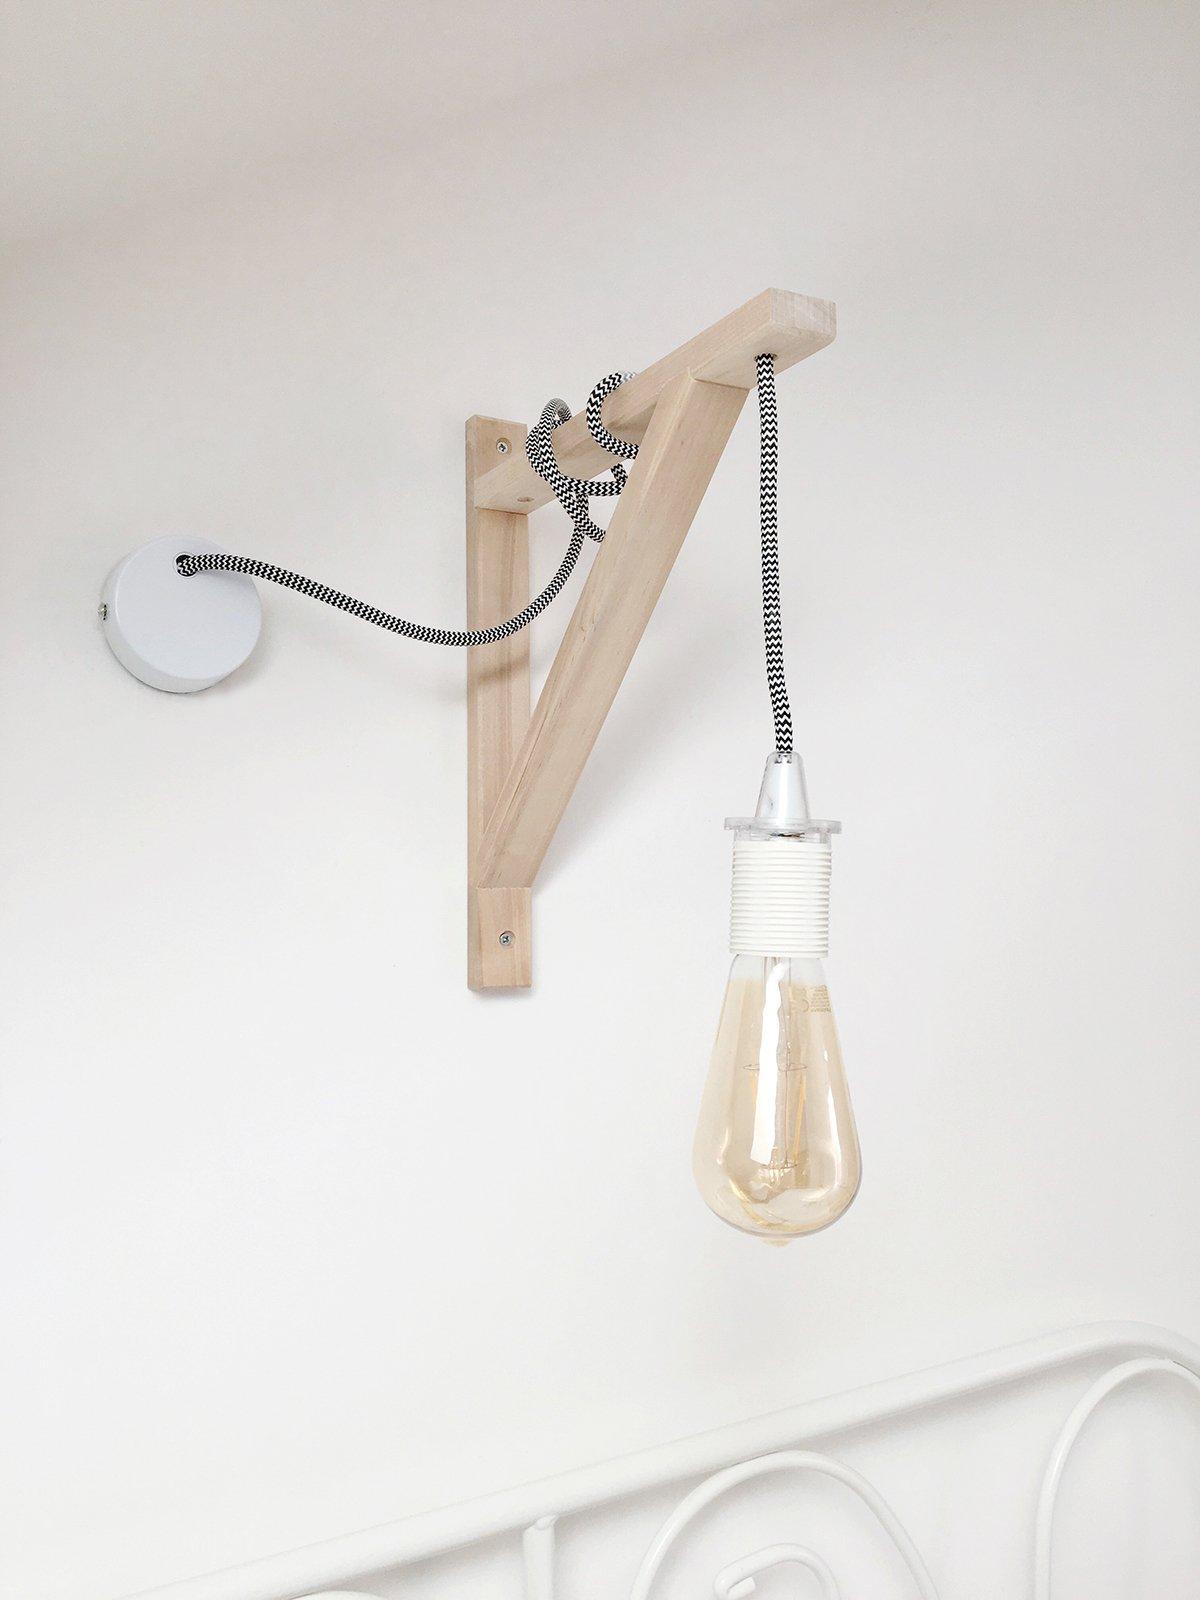 DIY_wall_hanging_lamp_lightbulb_1